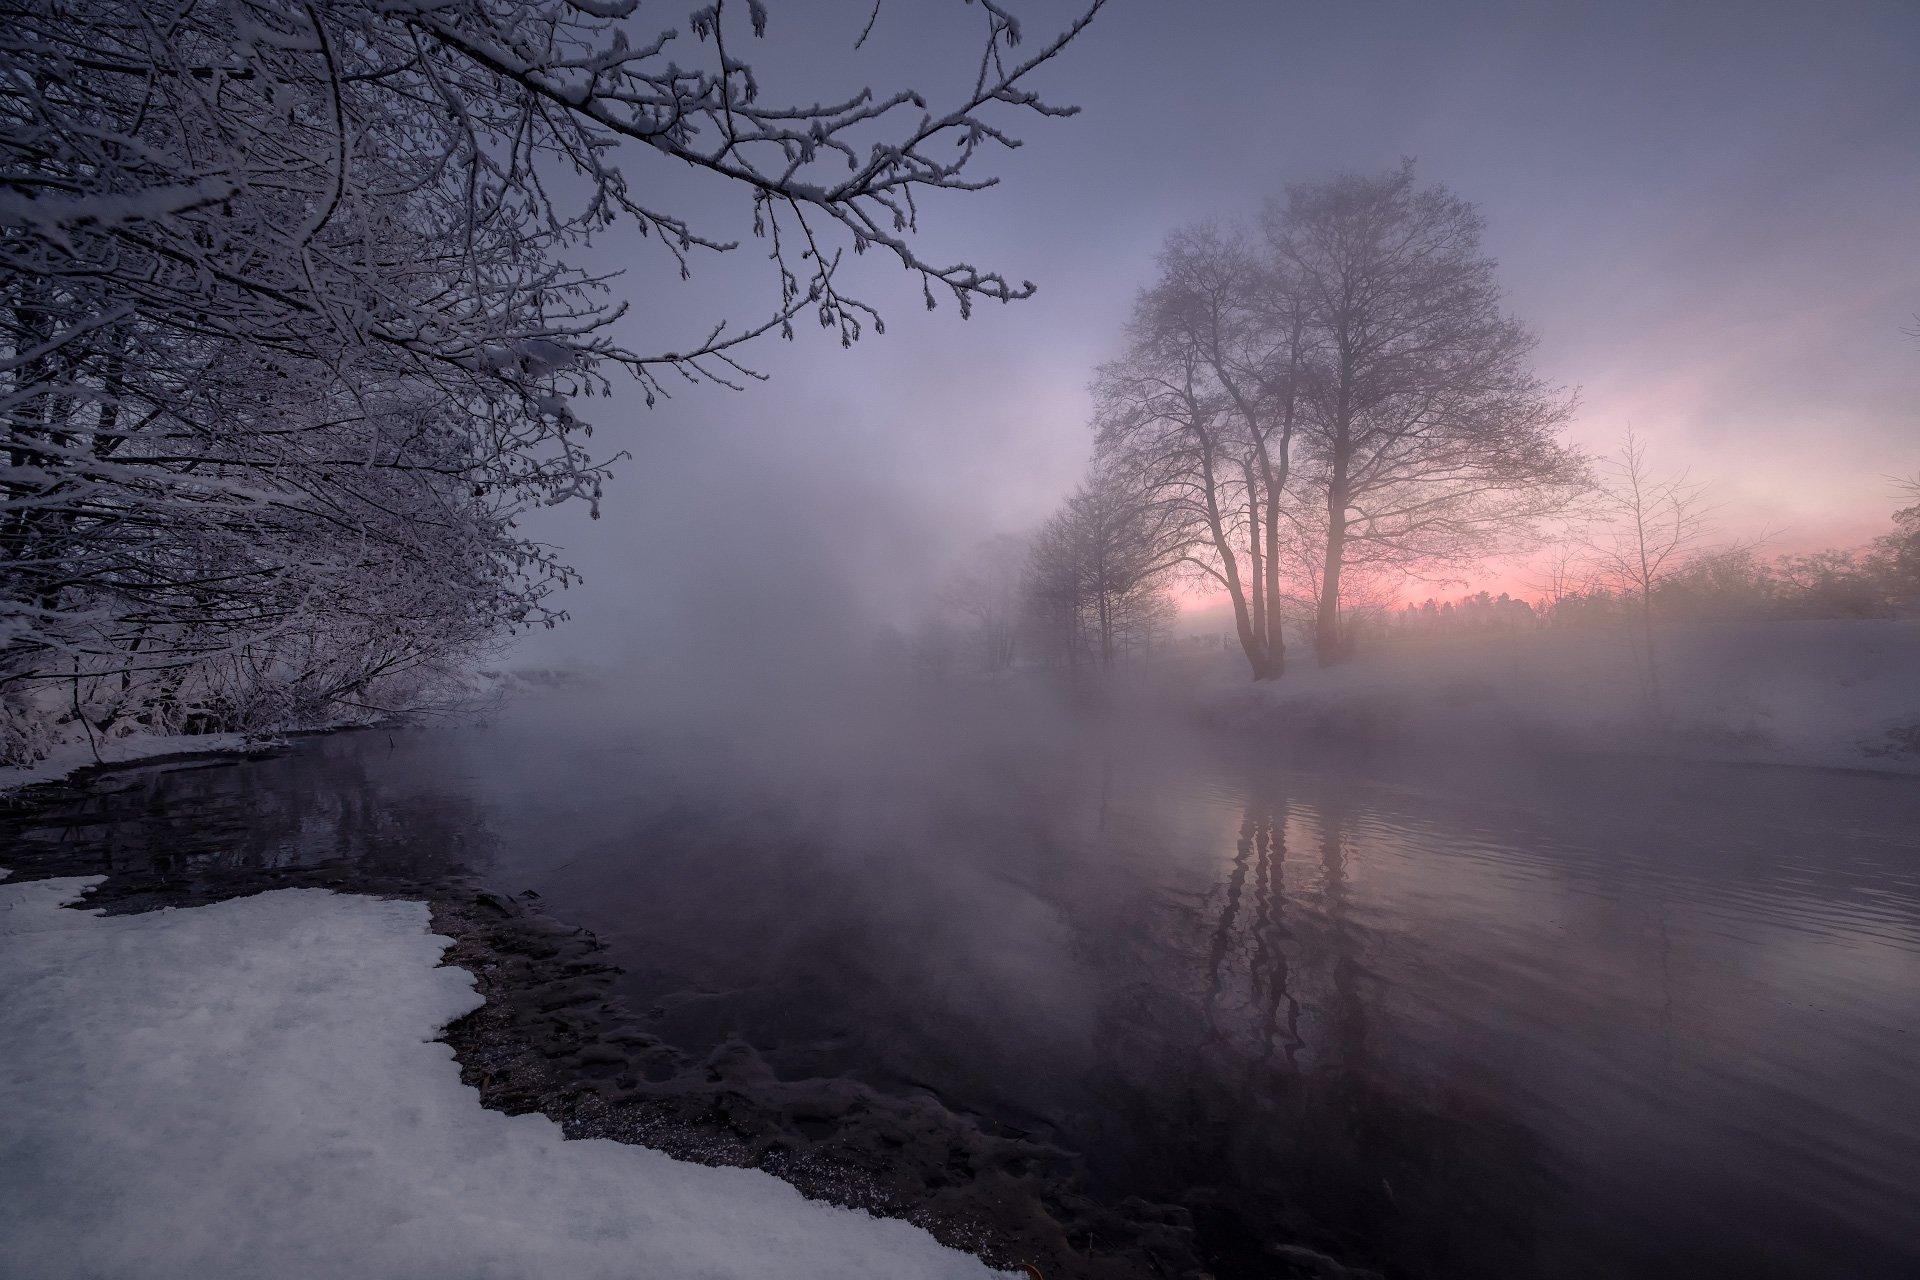 красково, пехорка, пейзаж, утро, туман, рассвет, холод, мороз, снег, солнце, деревья, москва, Андрей Чиж